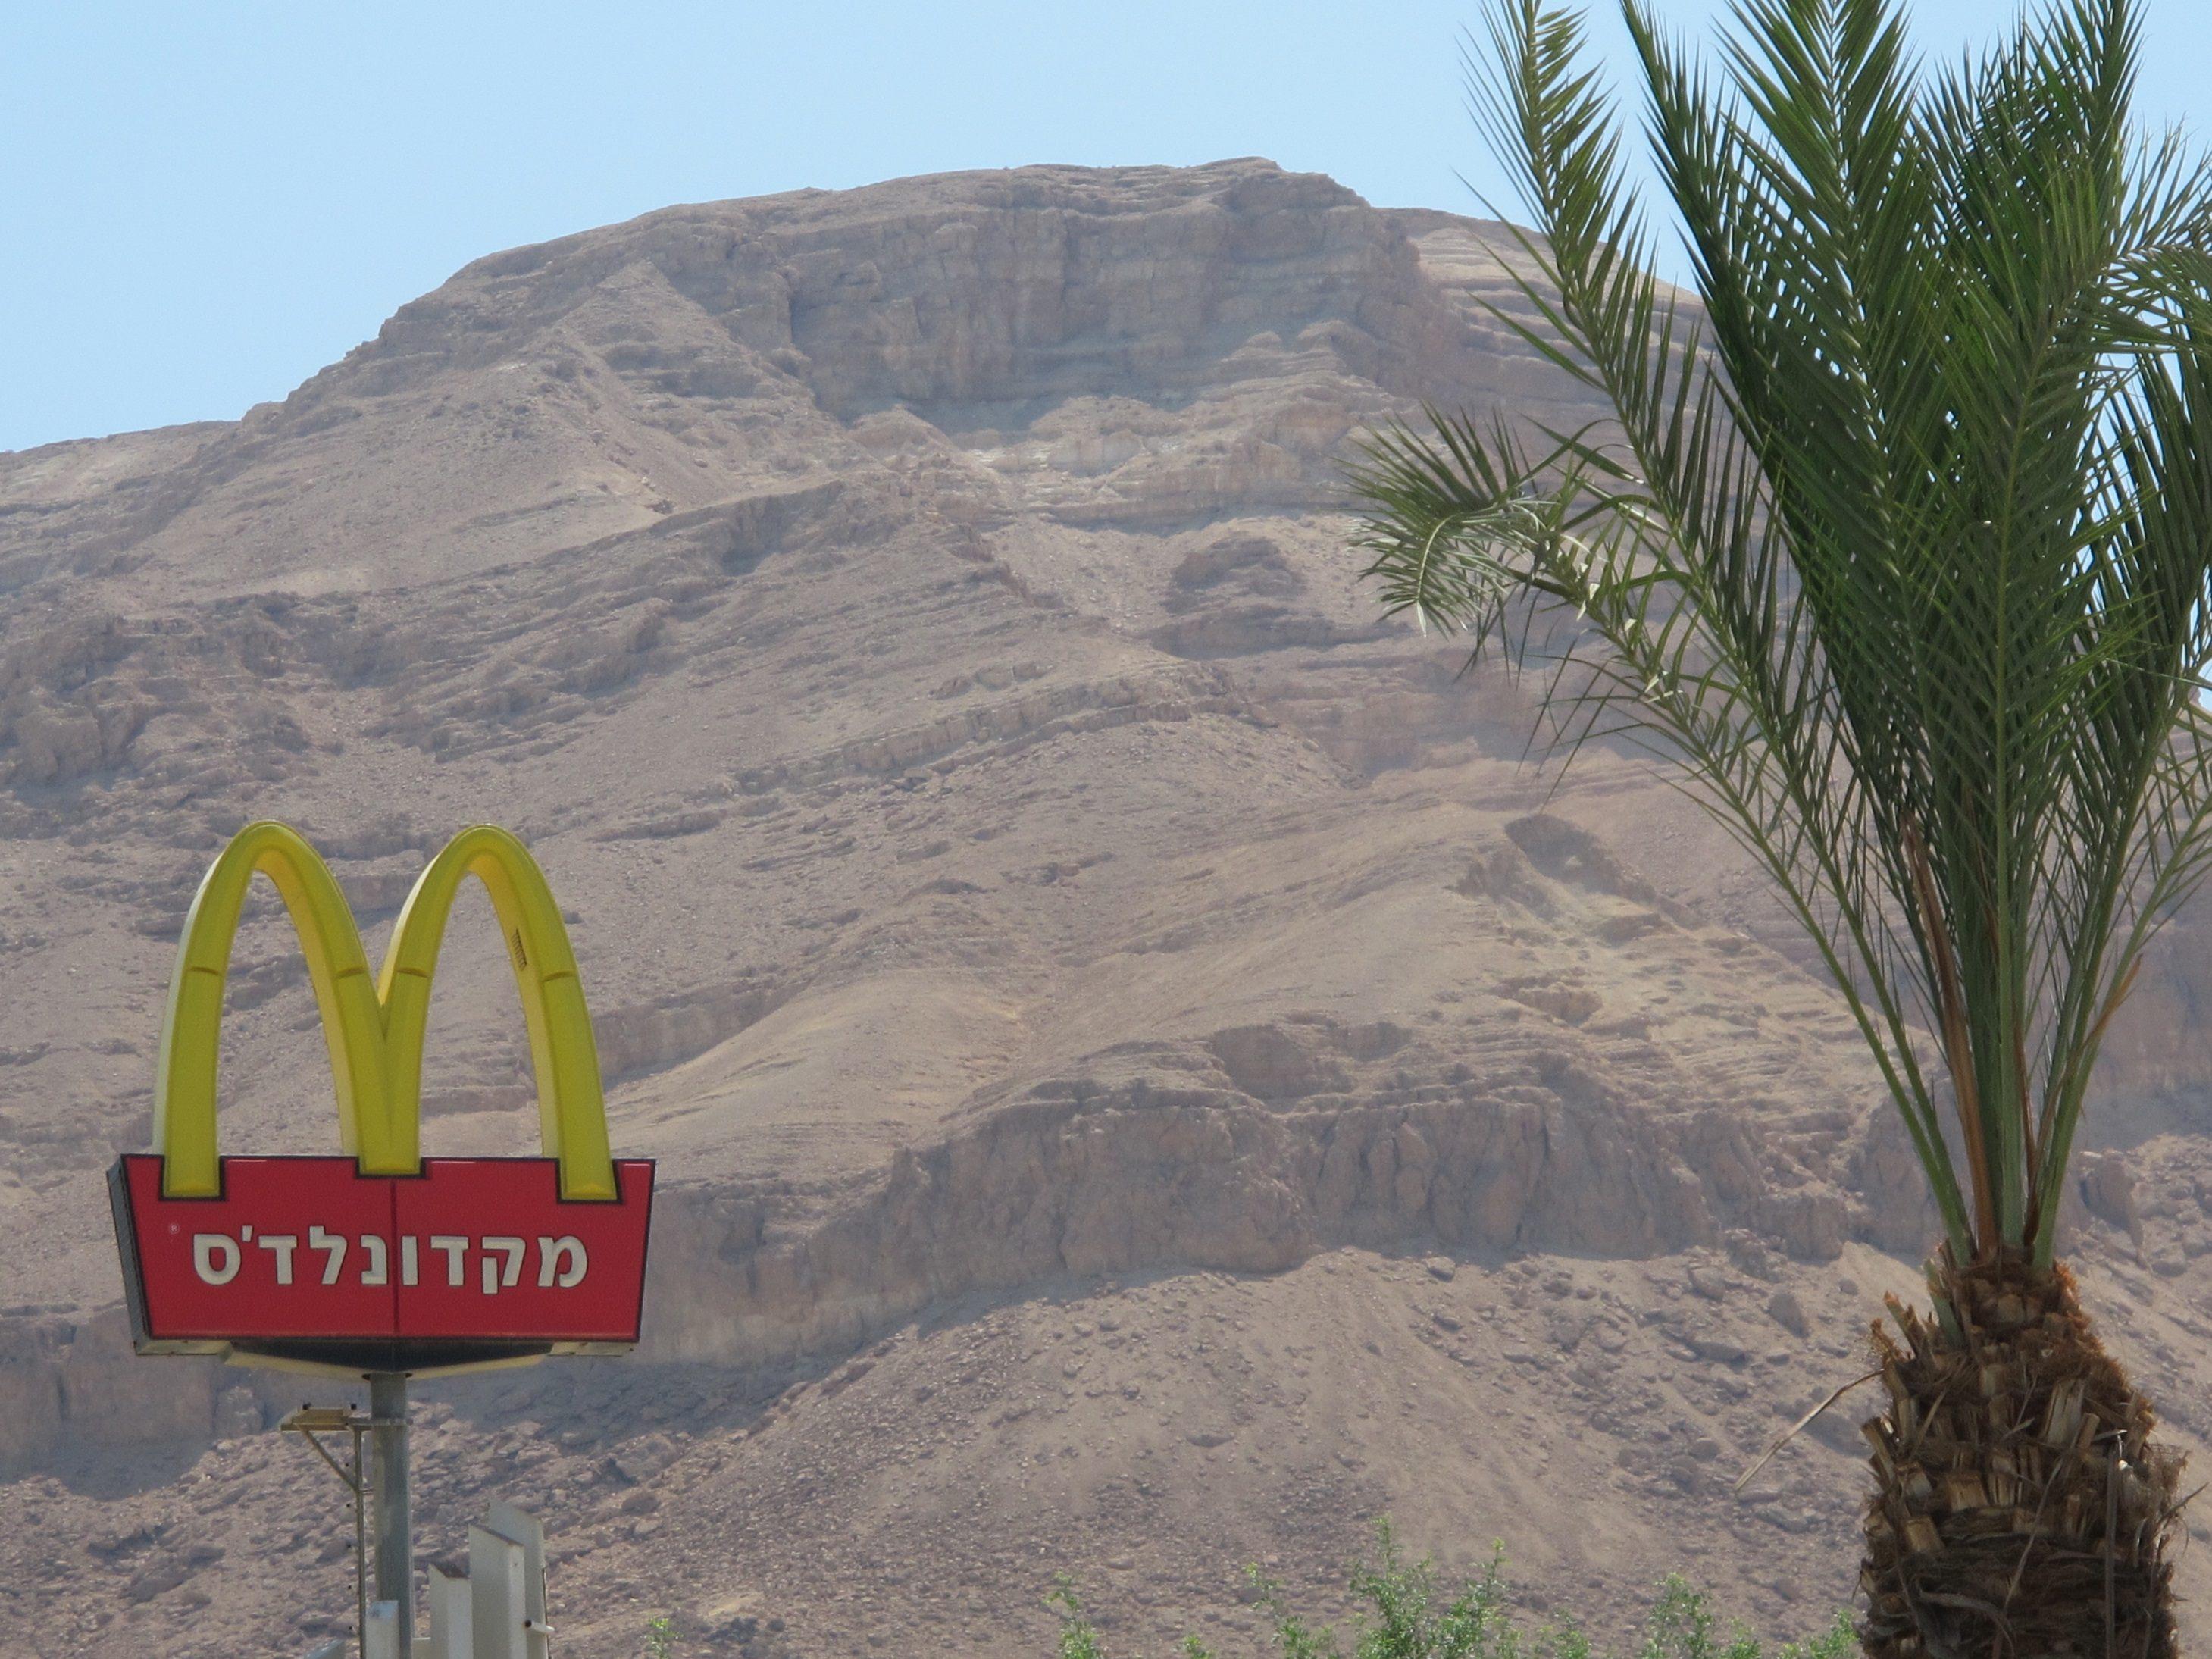 McDonald's Israel desert Gueztoub